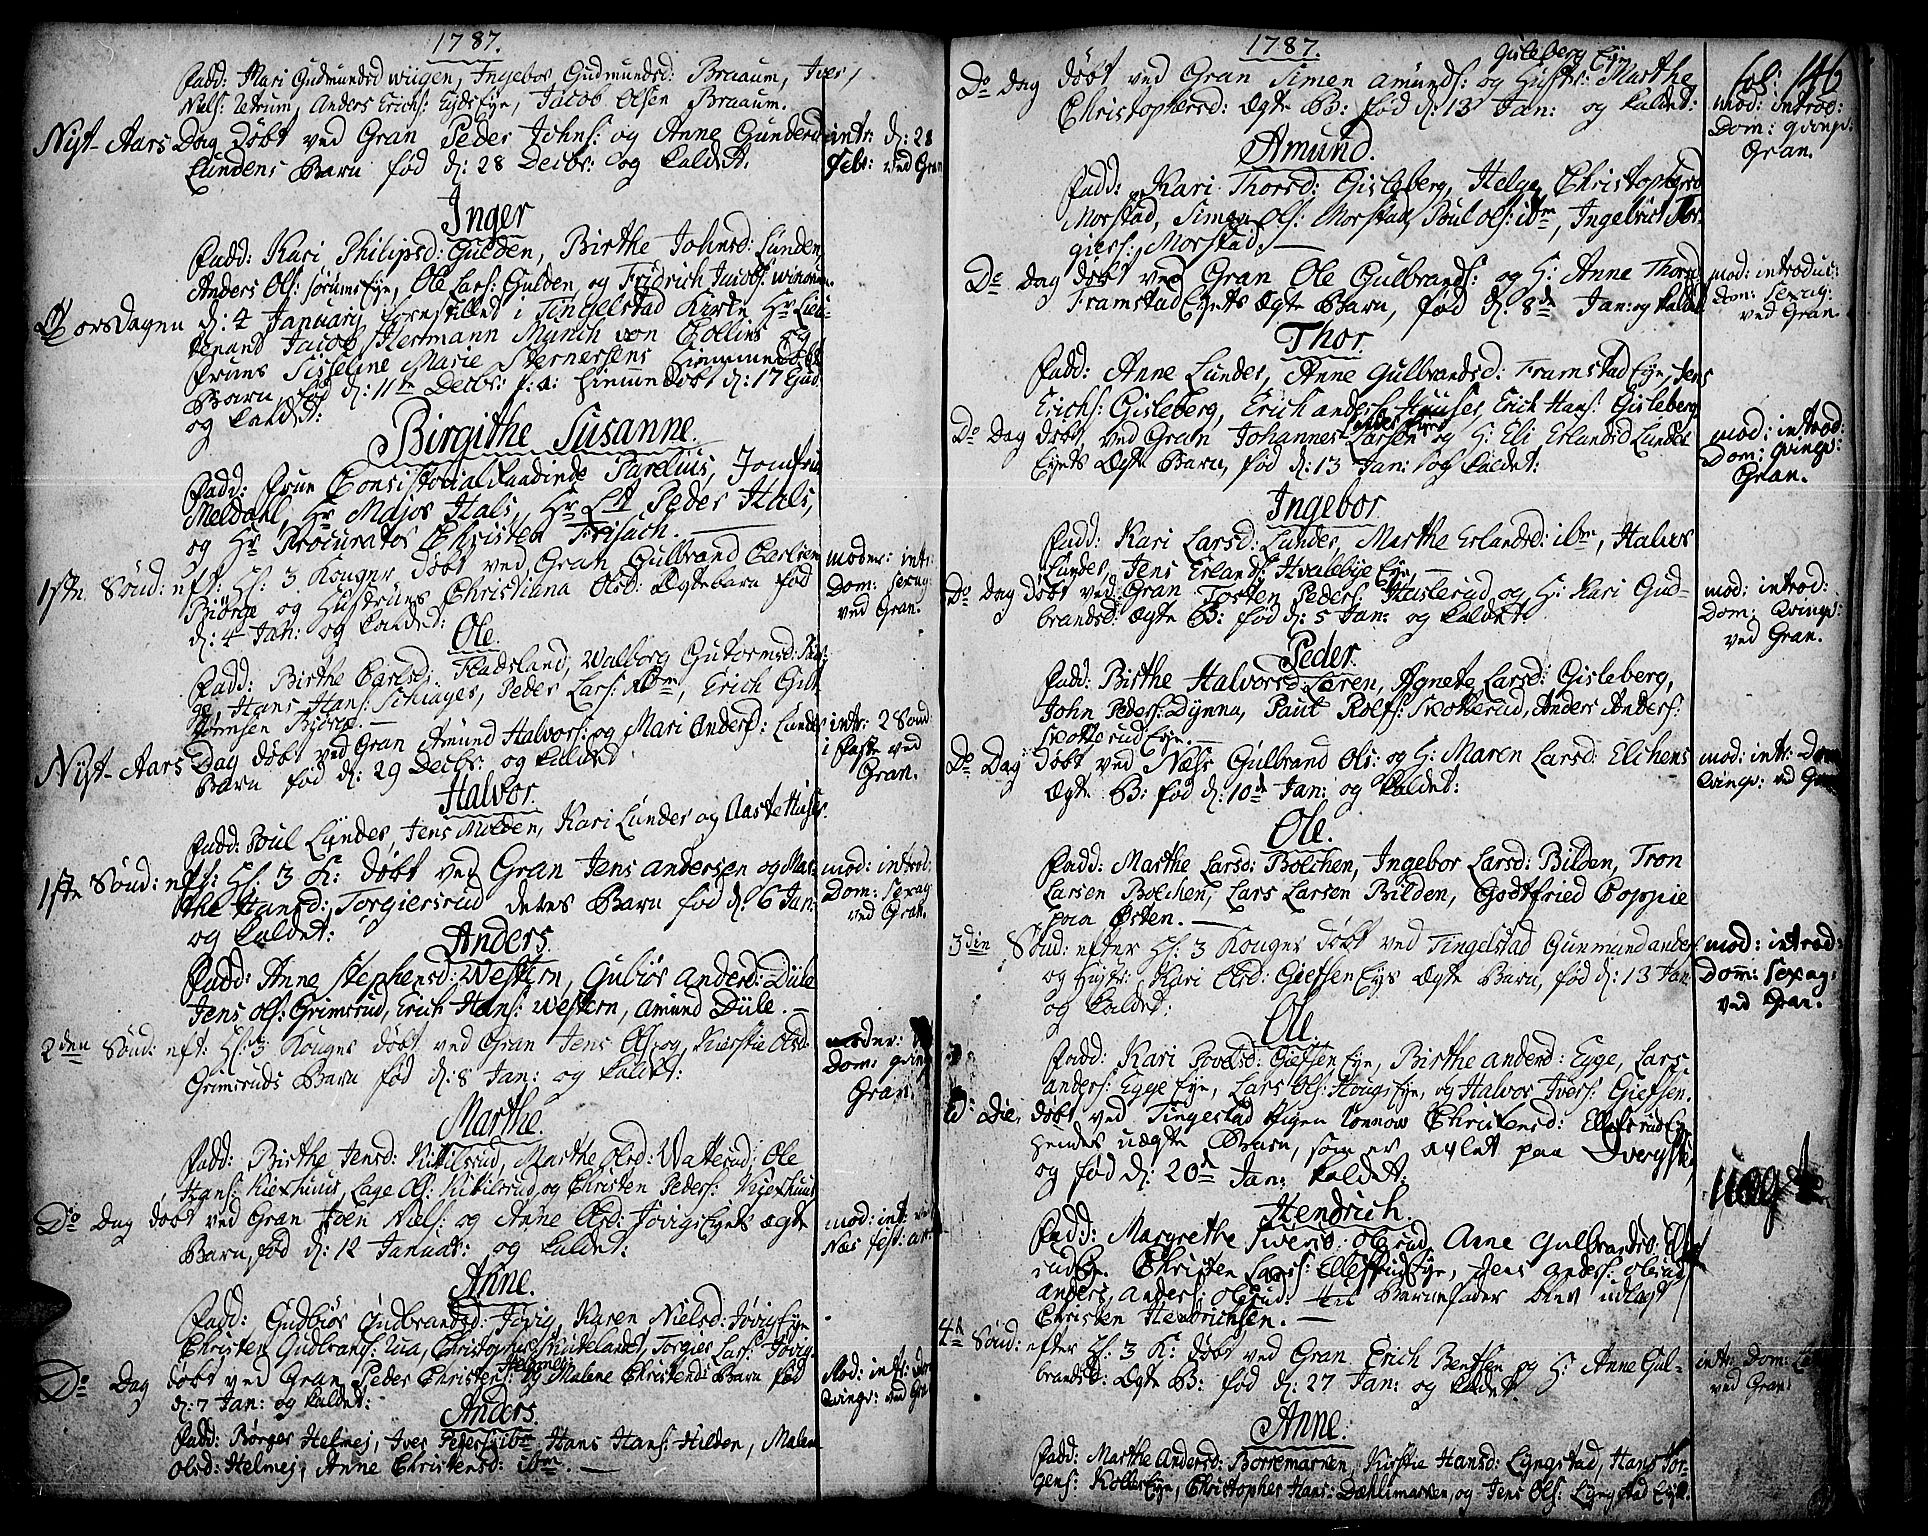 SAH, Gran prestekontor, Ministerialbok nr. 5, 1776-1788, s. 146